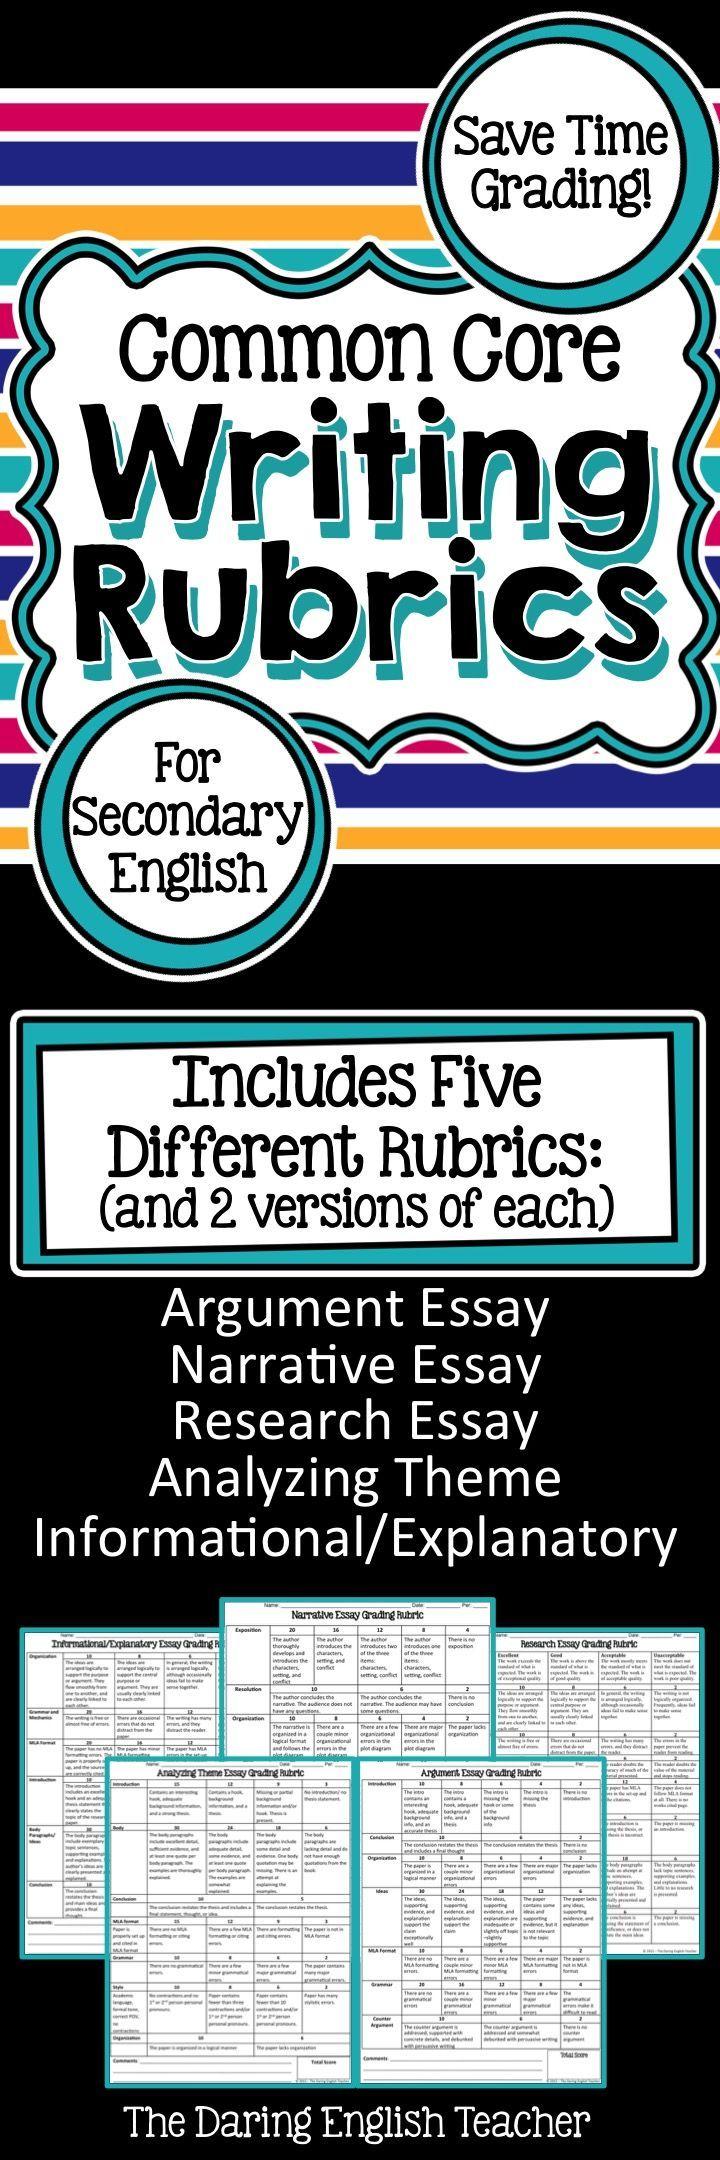 Personal Narrative Genre Six Traits of Writing Scoring Rubric Carpinteria  Rural Friedrich